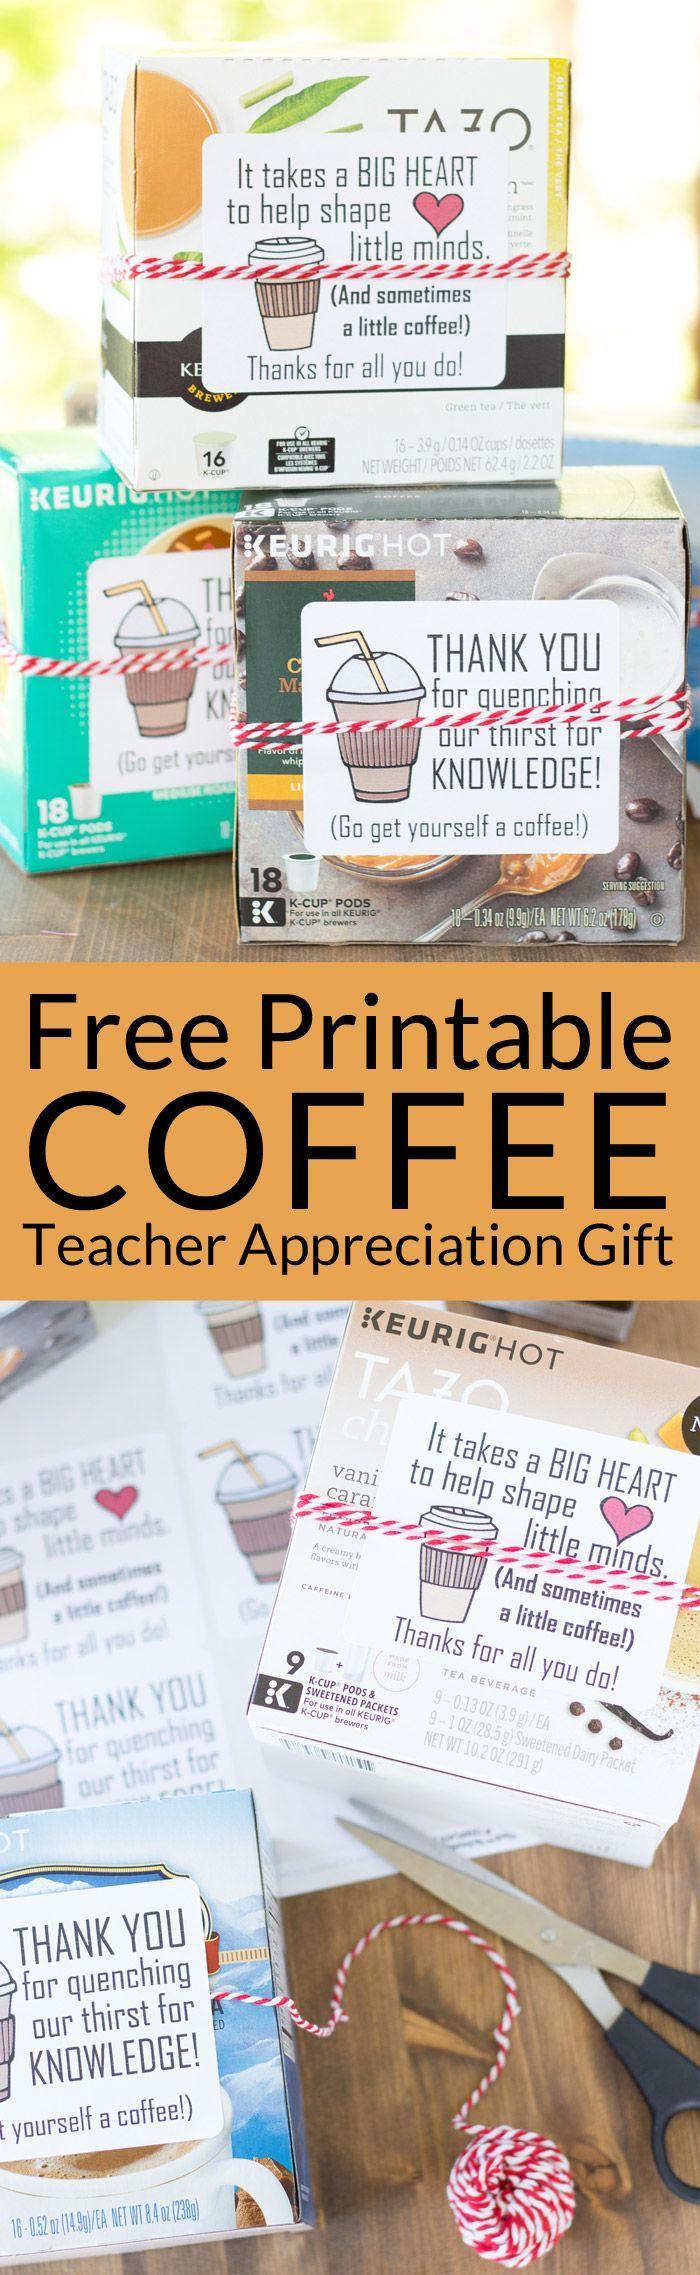 The 5 Minute Coffee Teacher Appreciation Gift